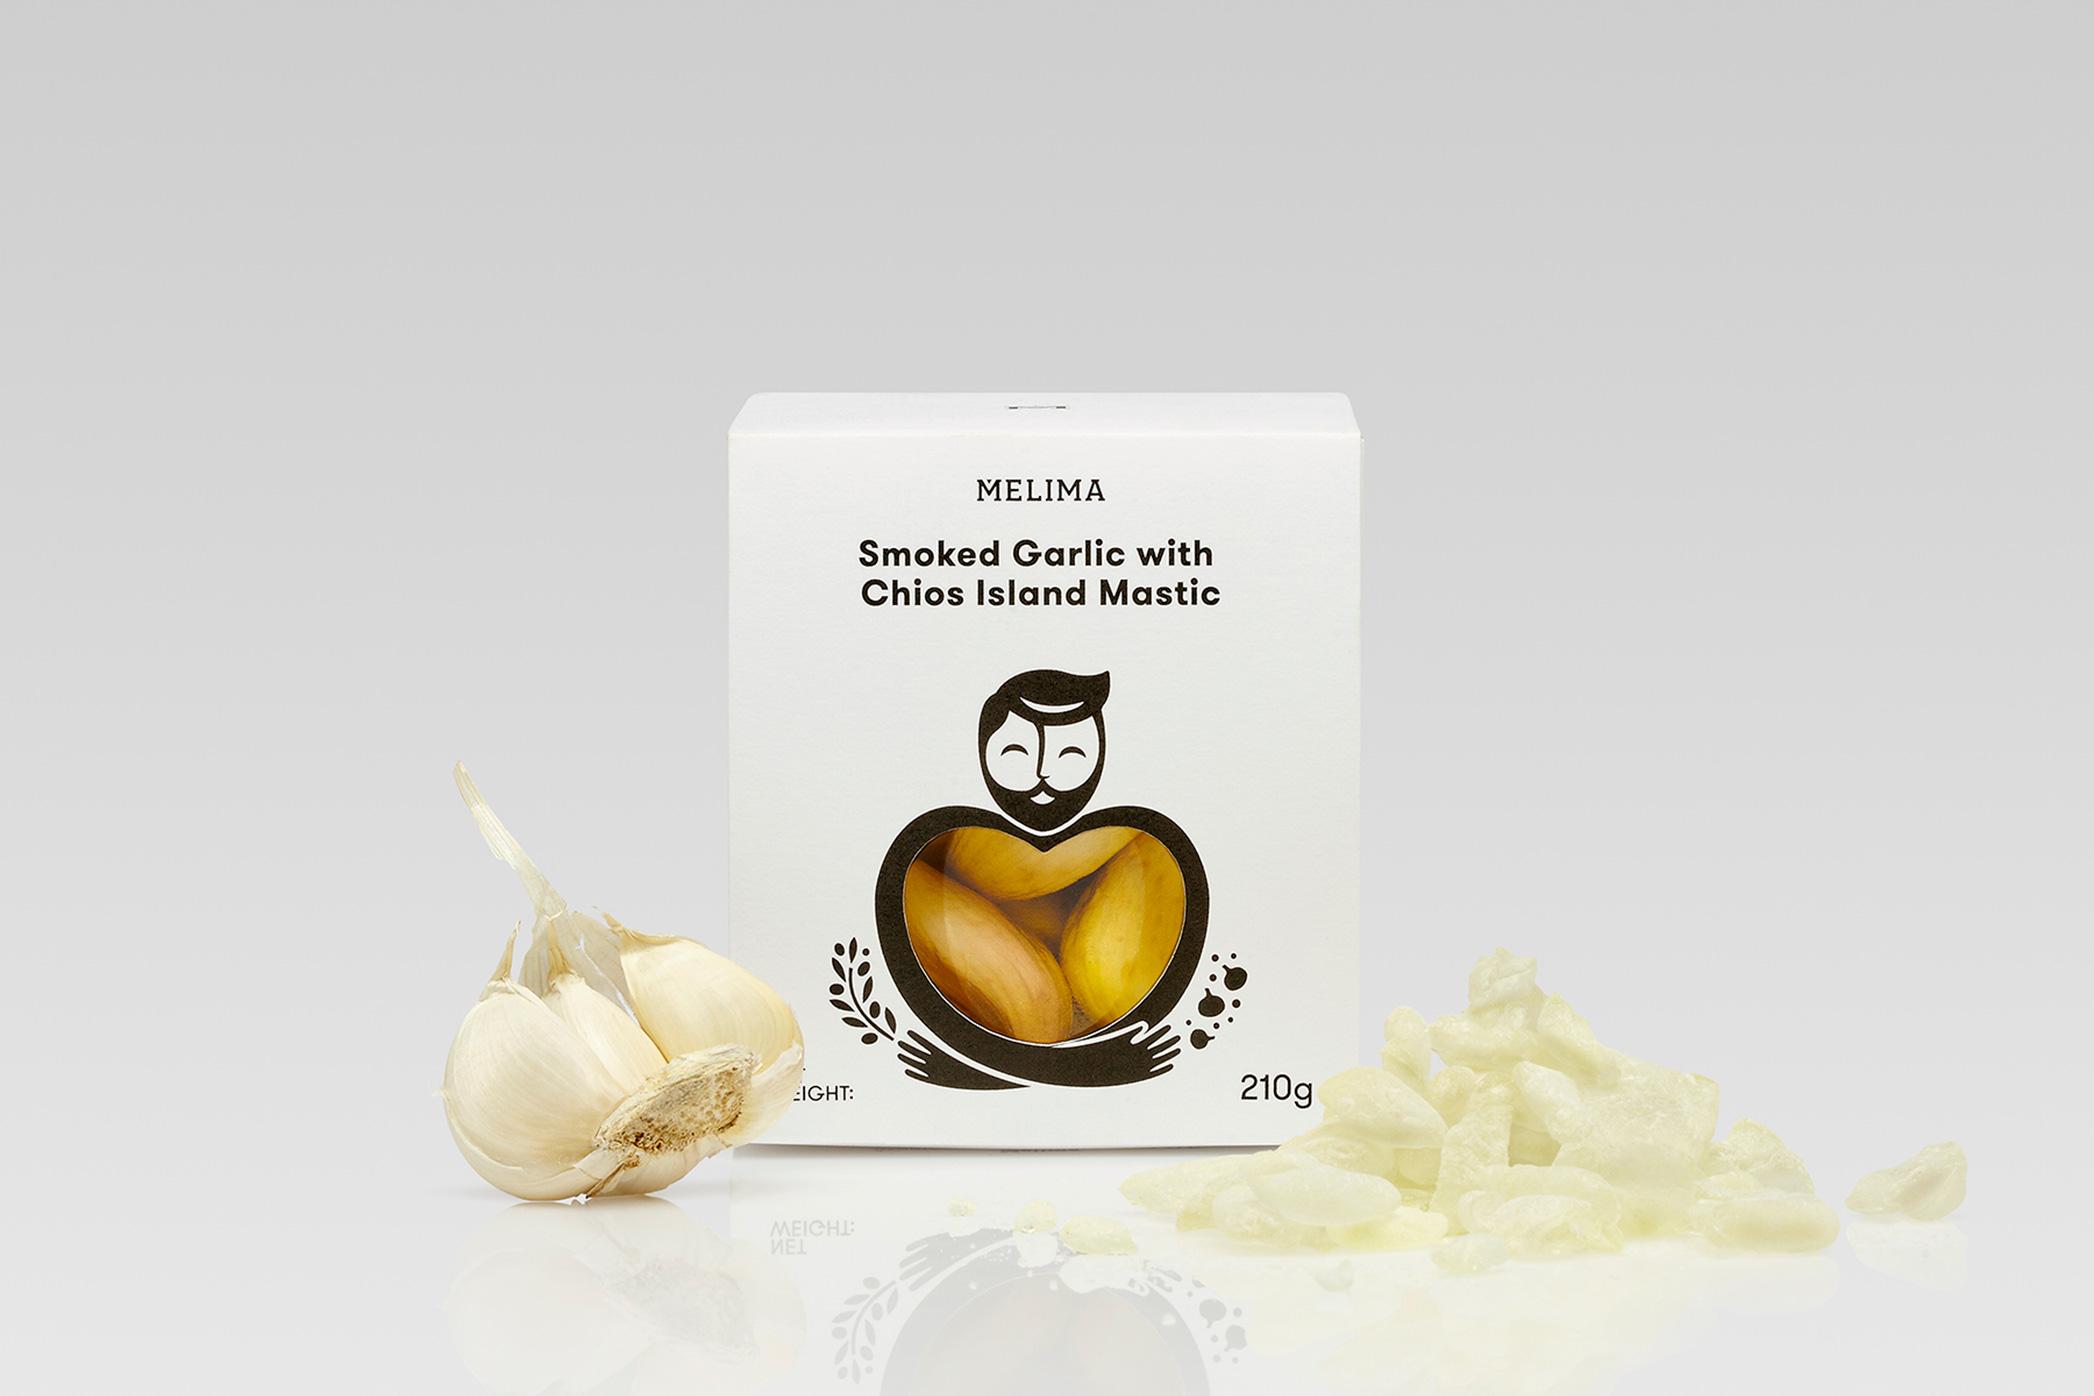 Smoked Garlic with Chios Island Mastic